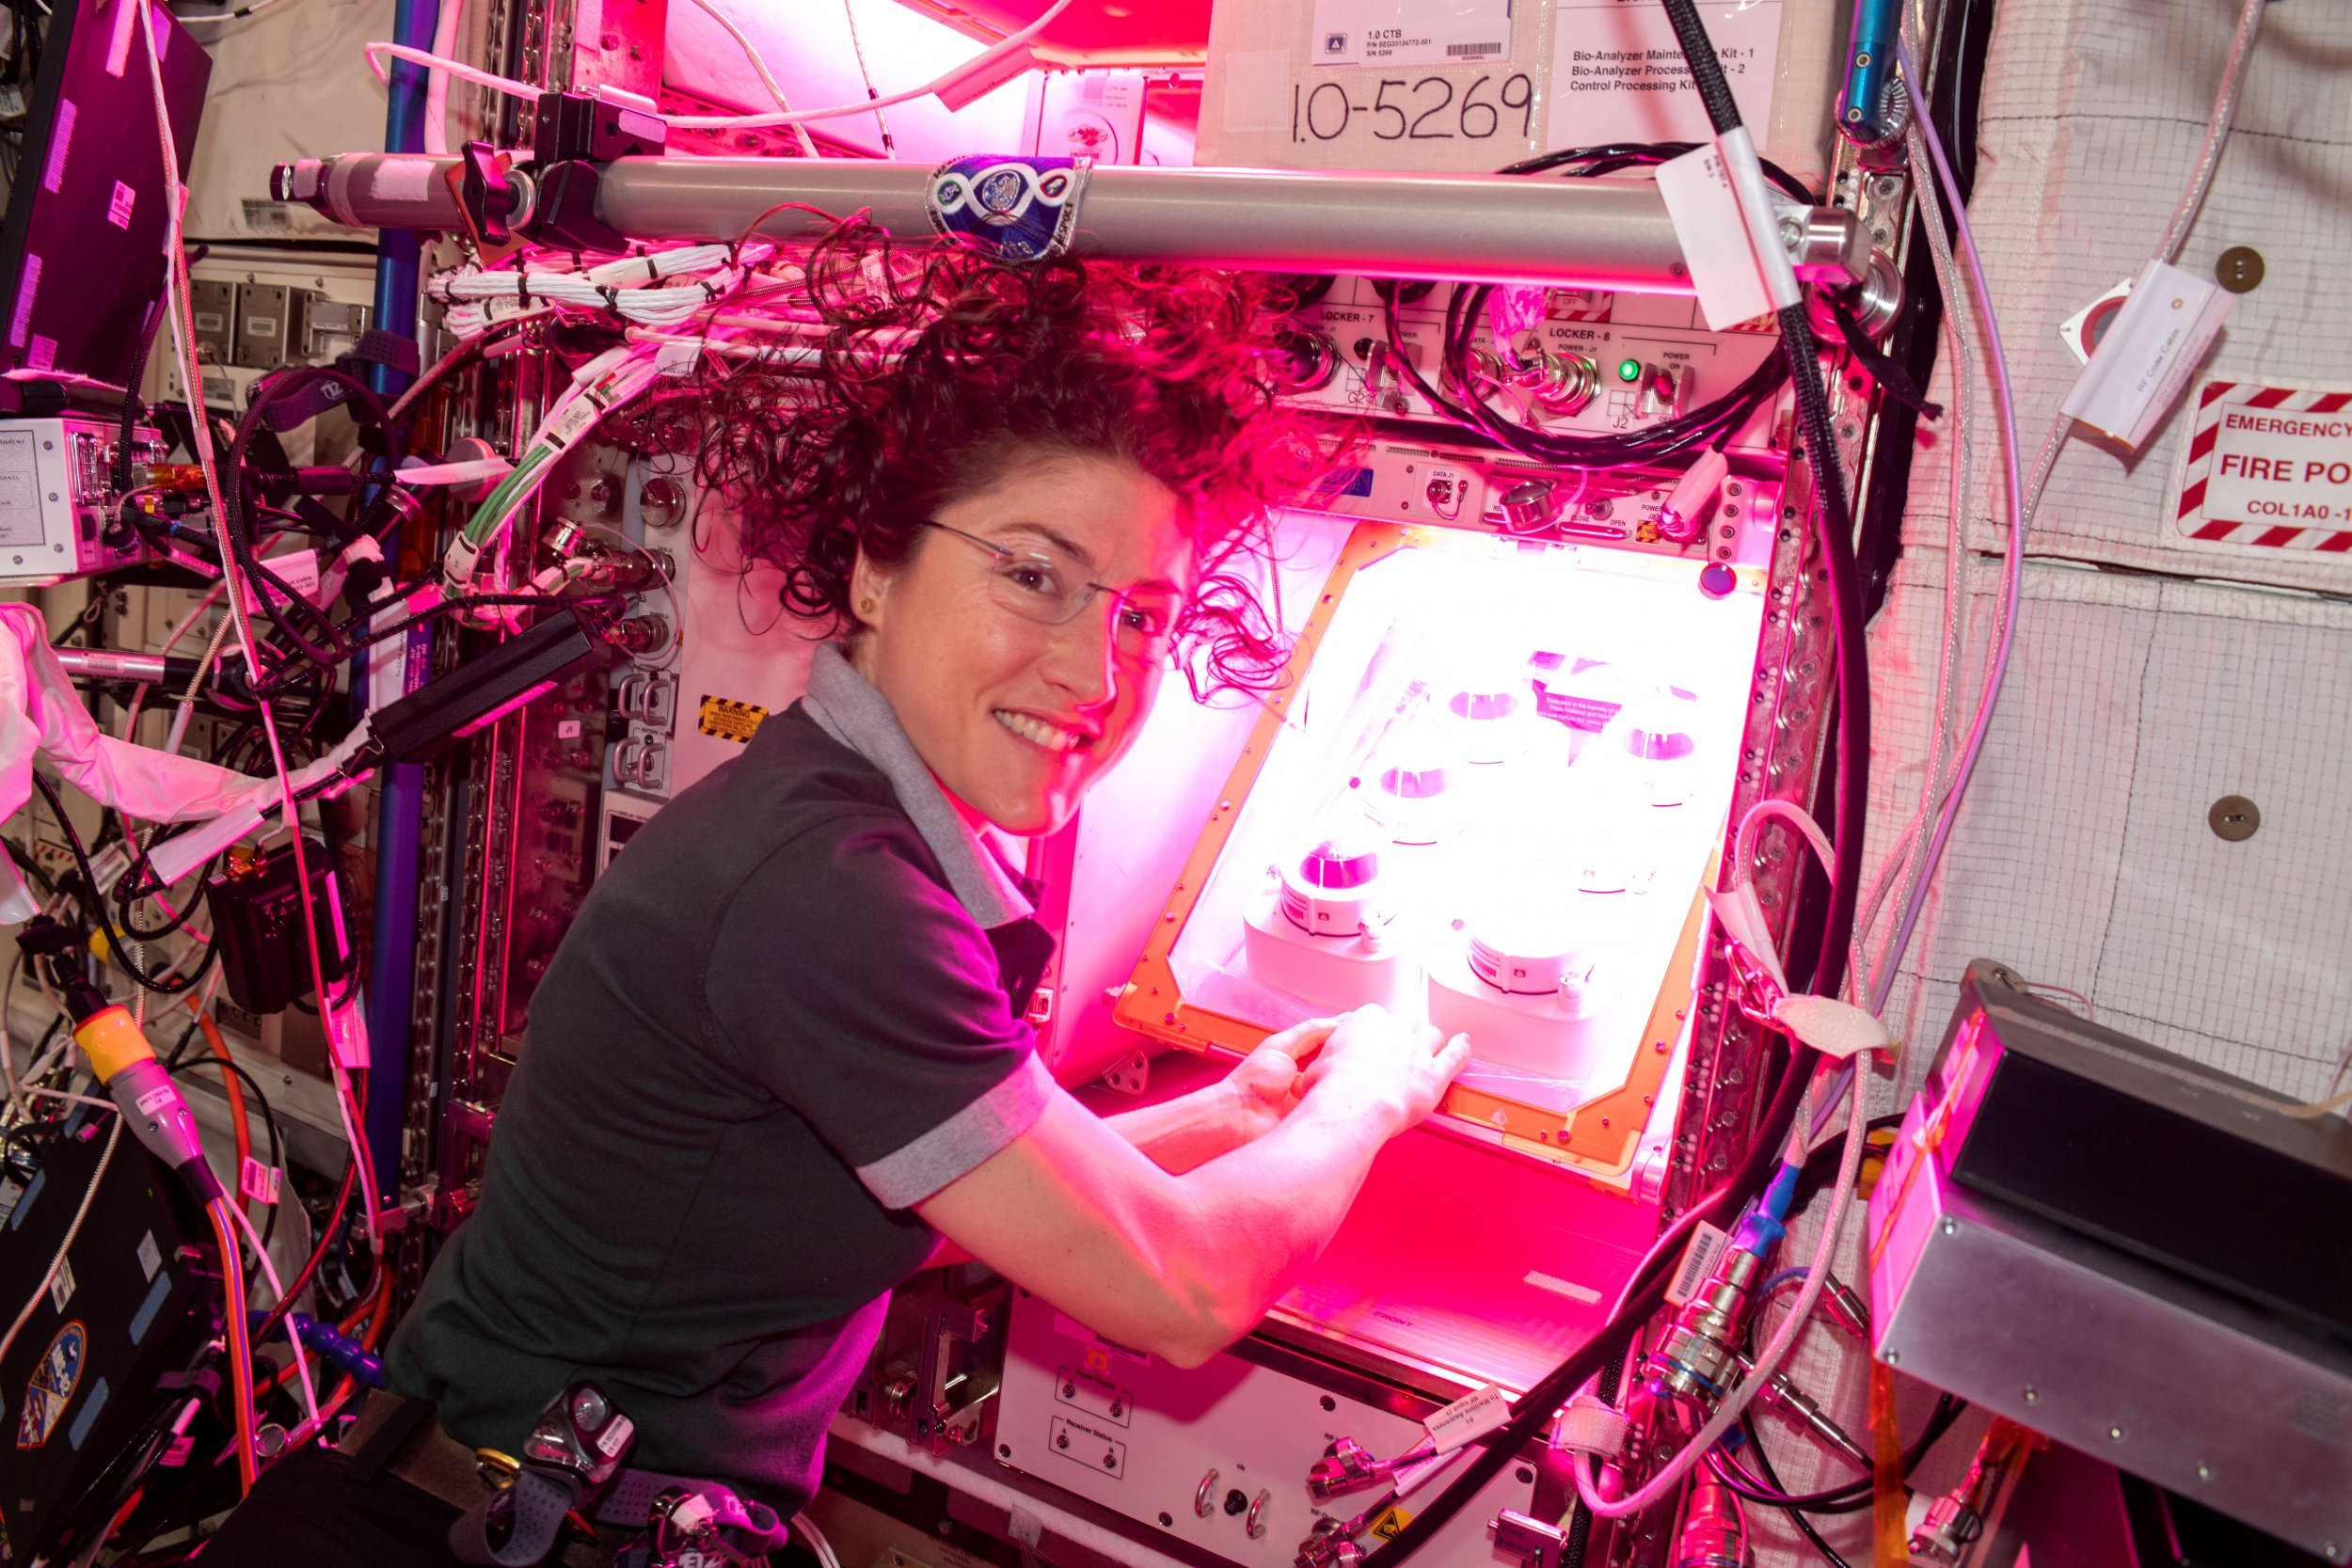 Veg-PONDS-02 experiment, NASA, ISS, astronaut